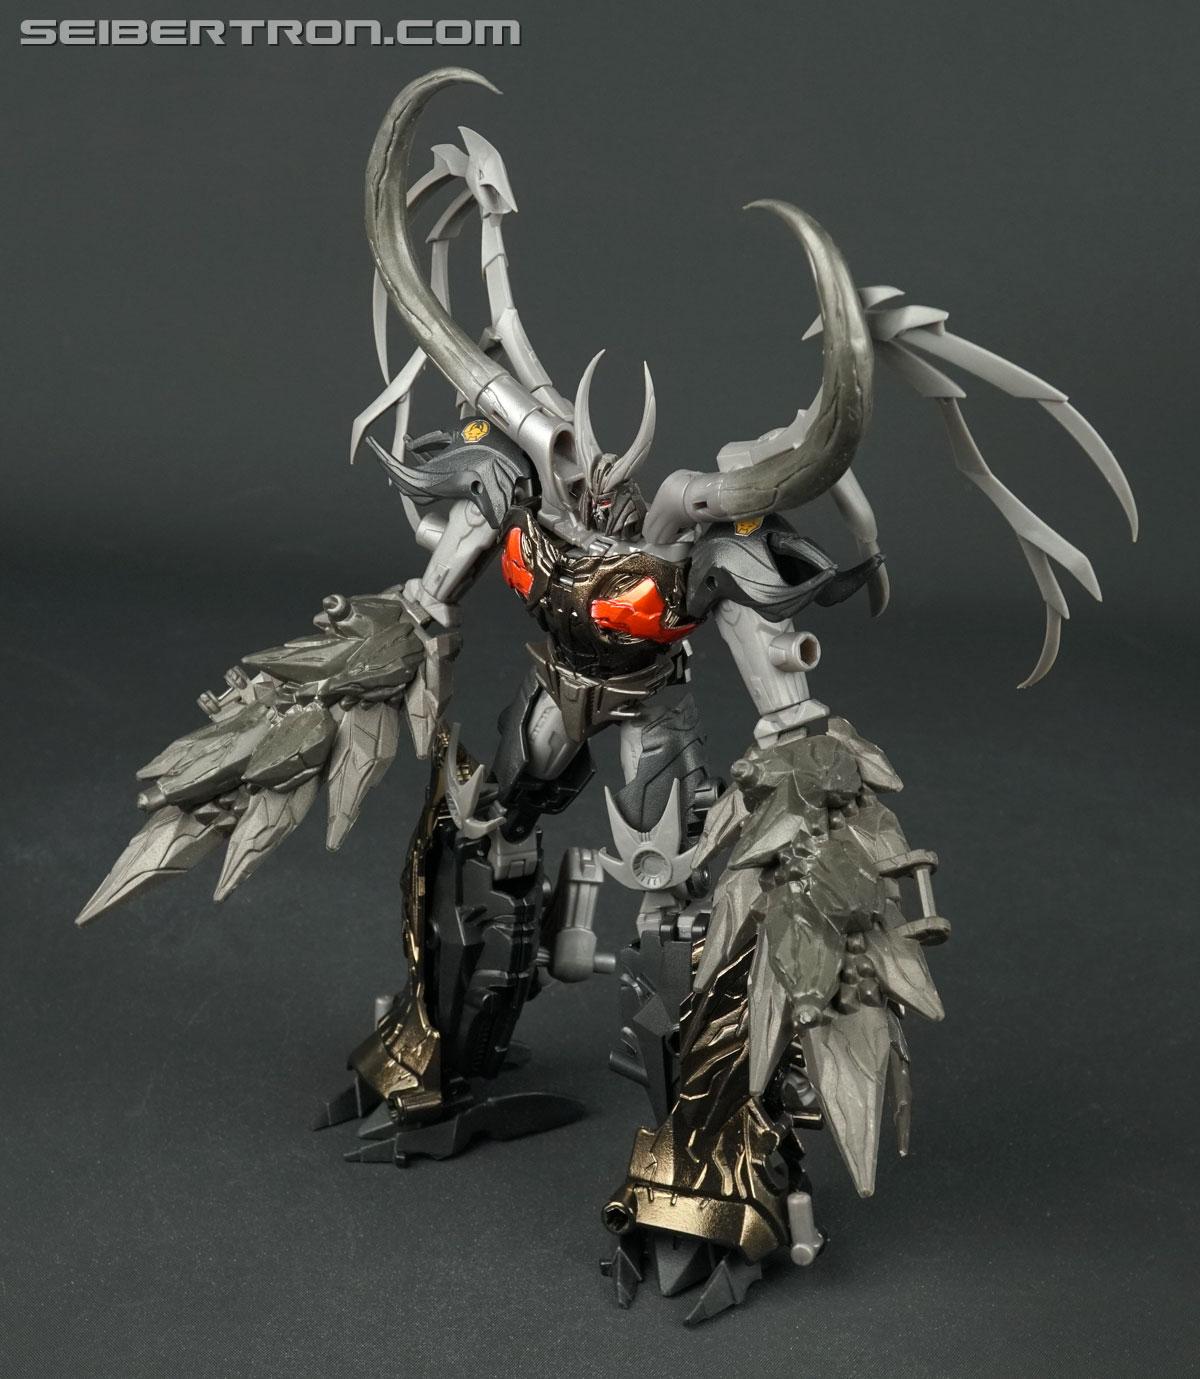 Transformers Arms Micron Nightmare Unicron (Image #84 of 156)